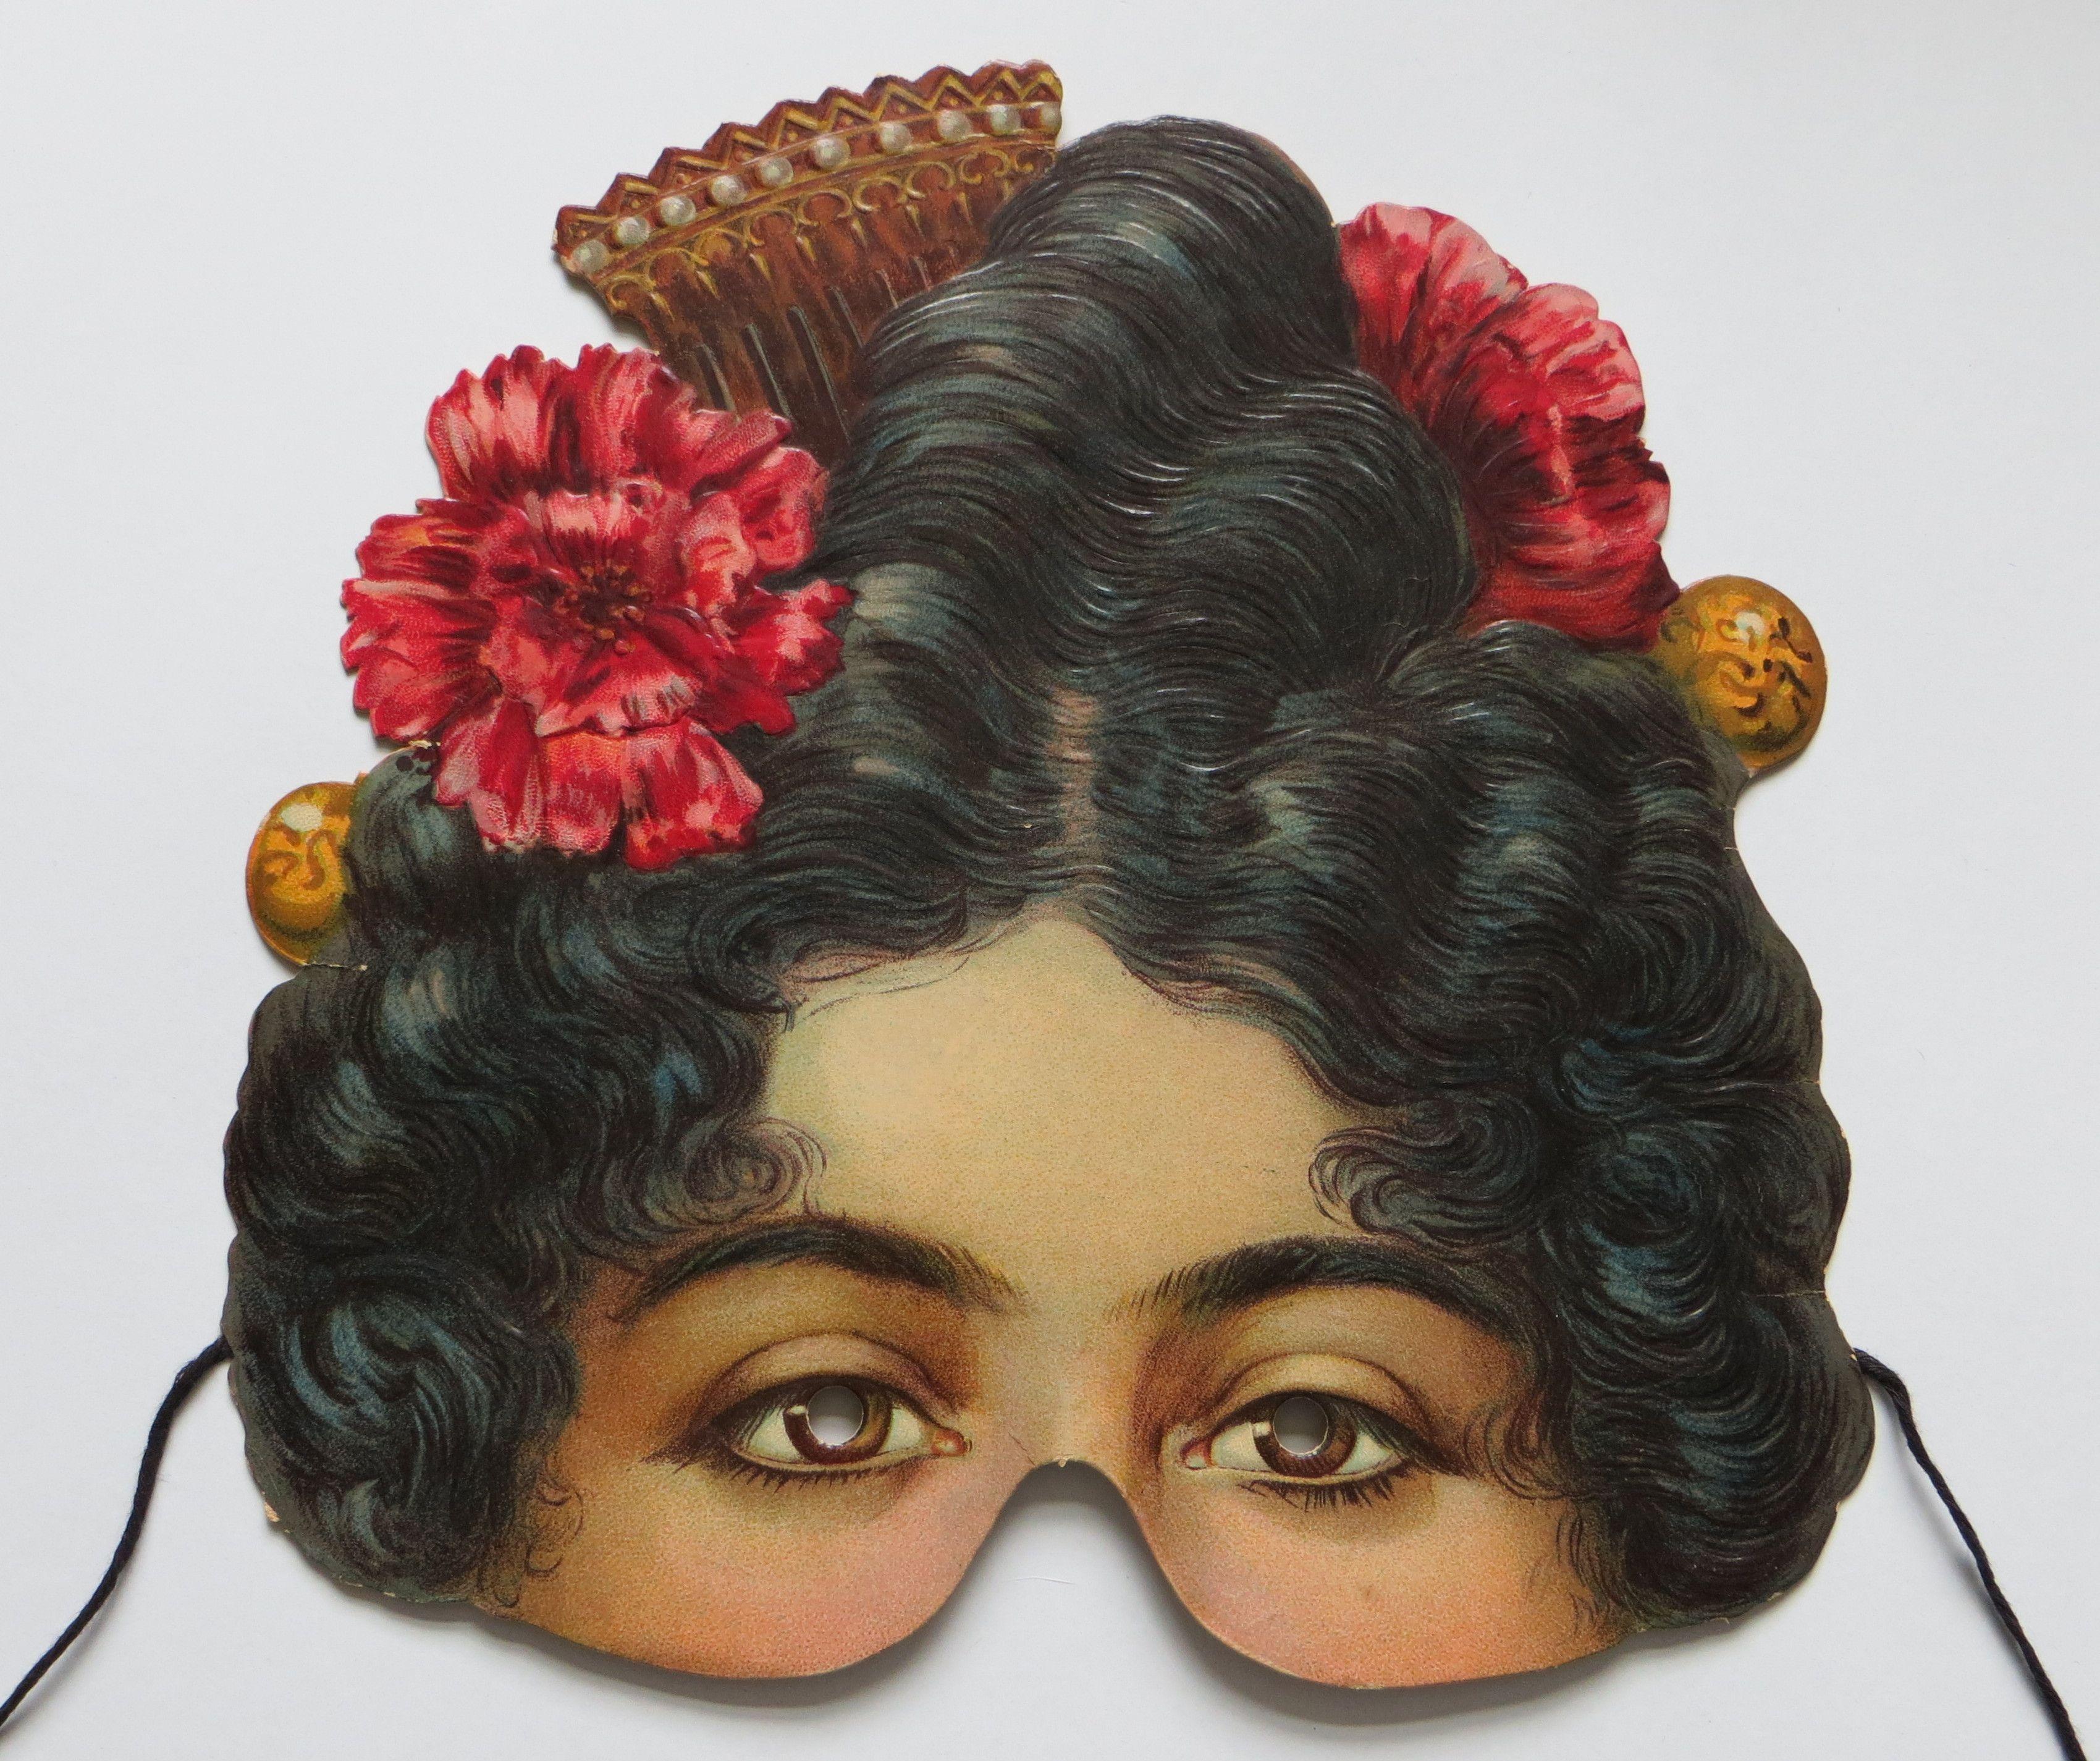 Full Sized Image Carman Mask Flamenco Paper Art Craft